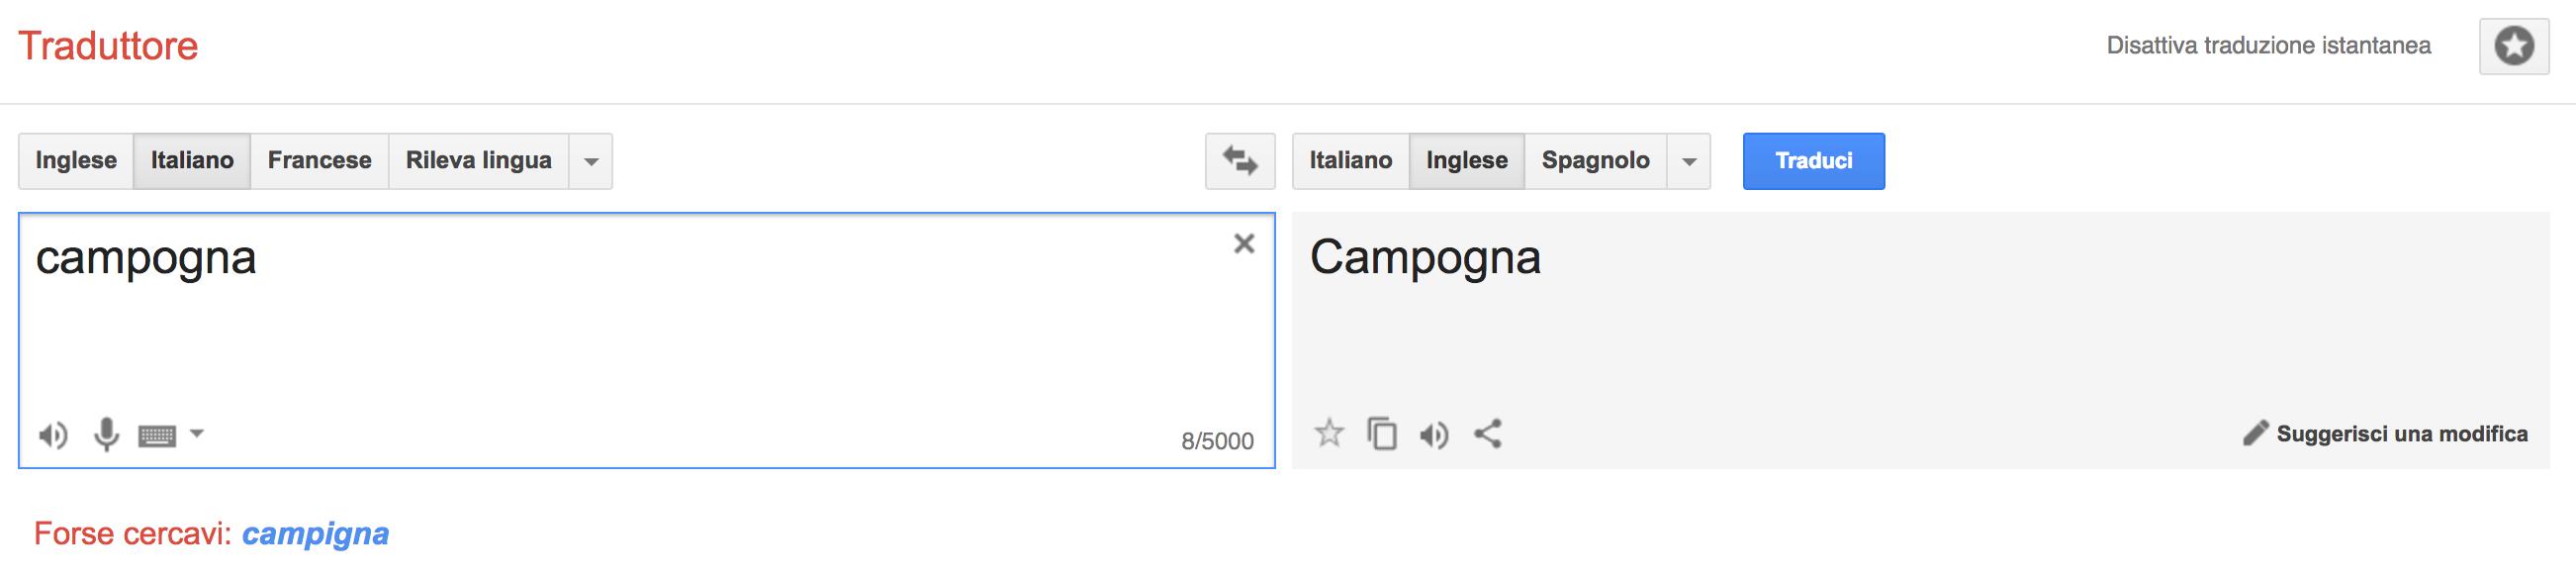 Cosa capisce Google Translate?